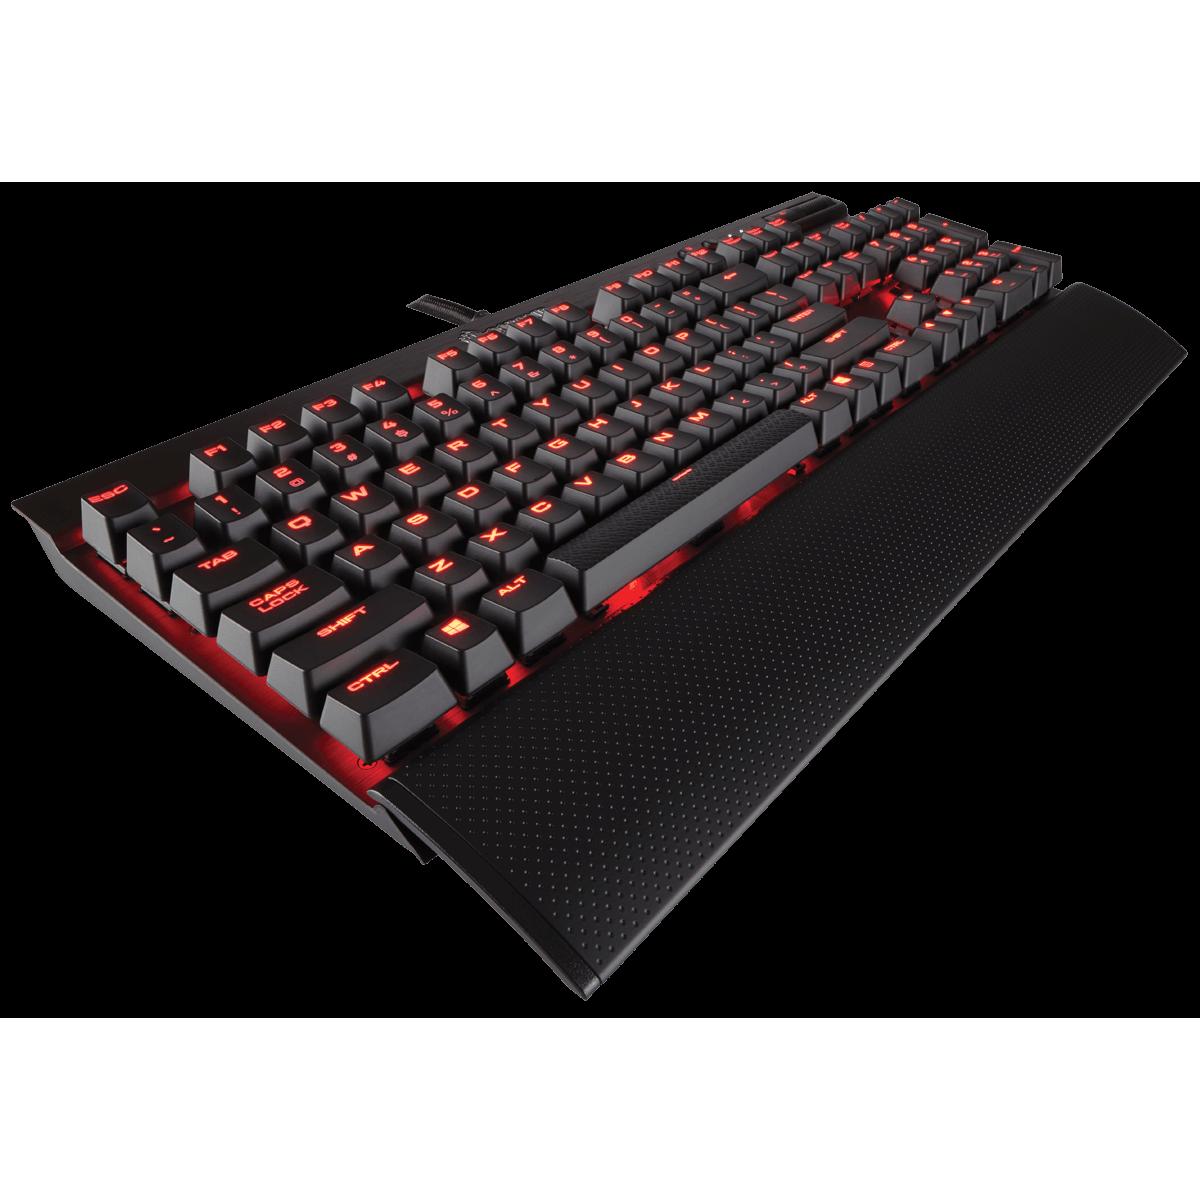 Teclado Mecânico Gamer Corsair K70 LUX, Switch Cherry MX Red, ABNT2, CH-9101020-BR